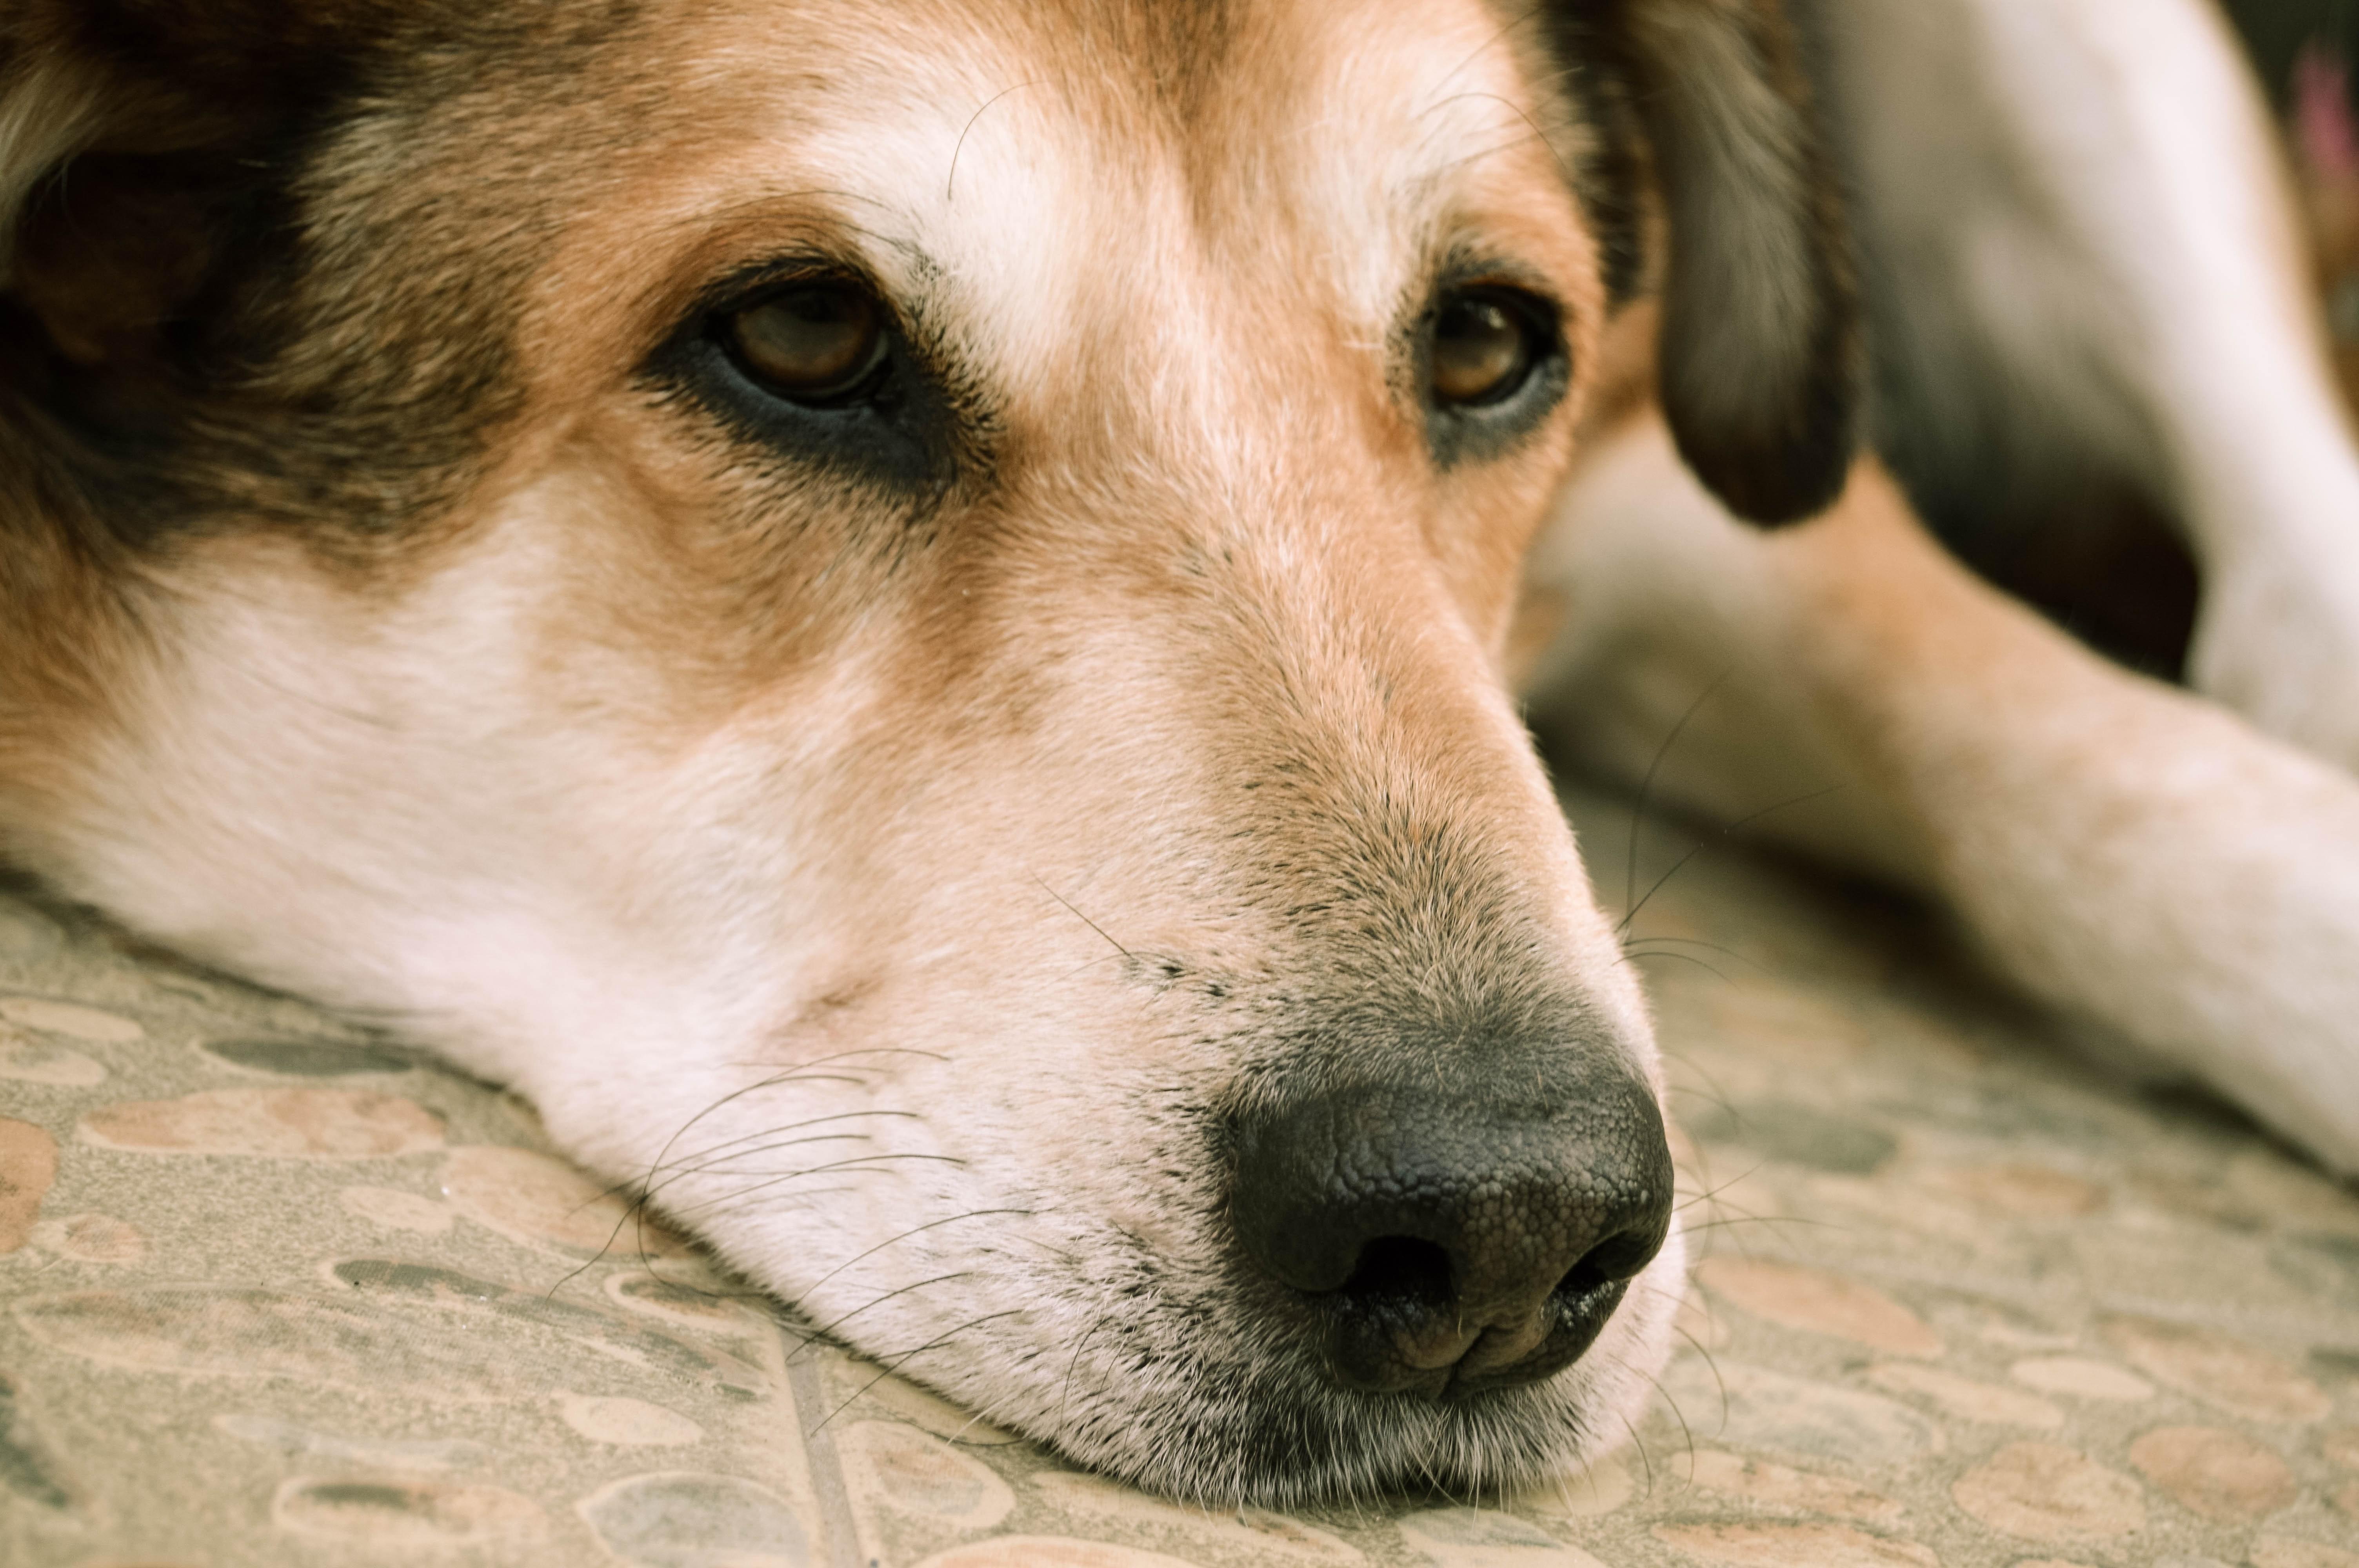 Black and tan short coat medium size dog lying on floor photo